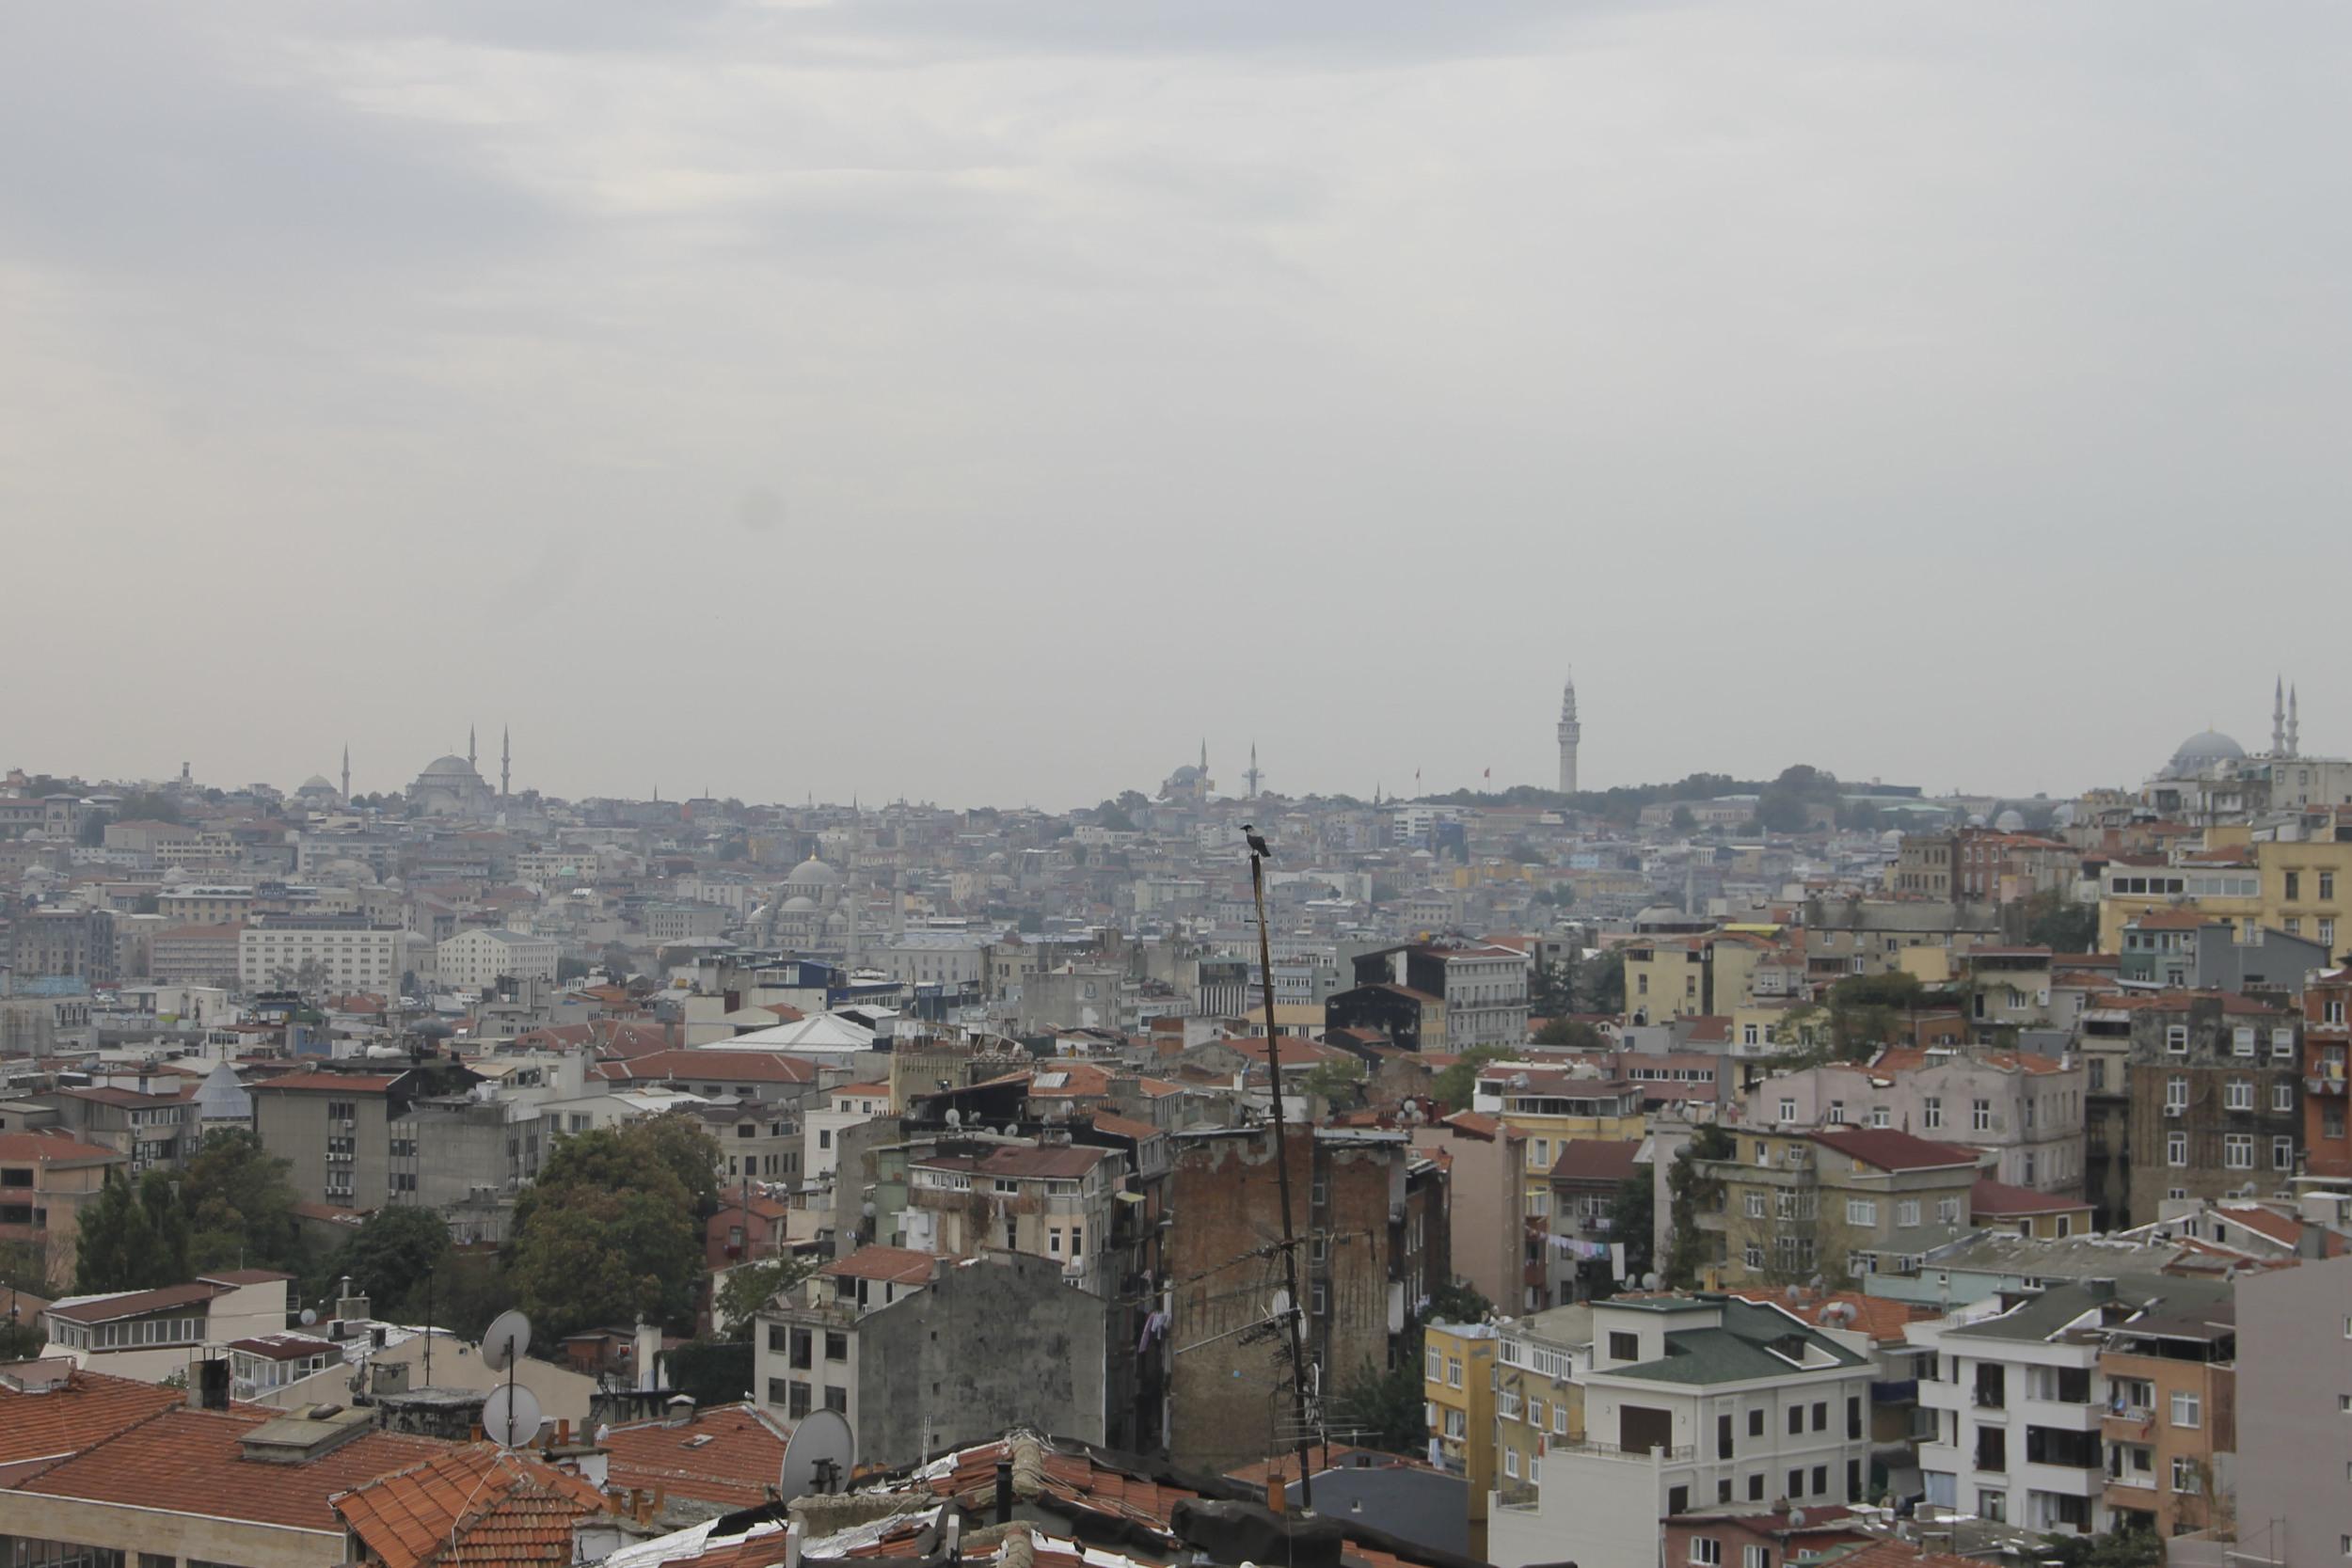 Istanbul, ygatonic on tour, Turkey yoga in istanbul2223.jpg